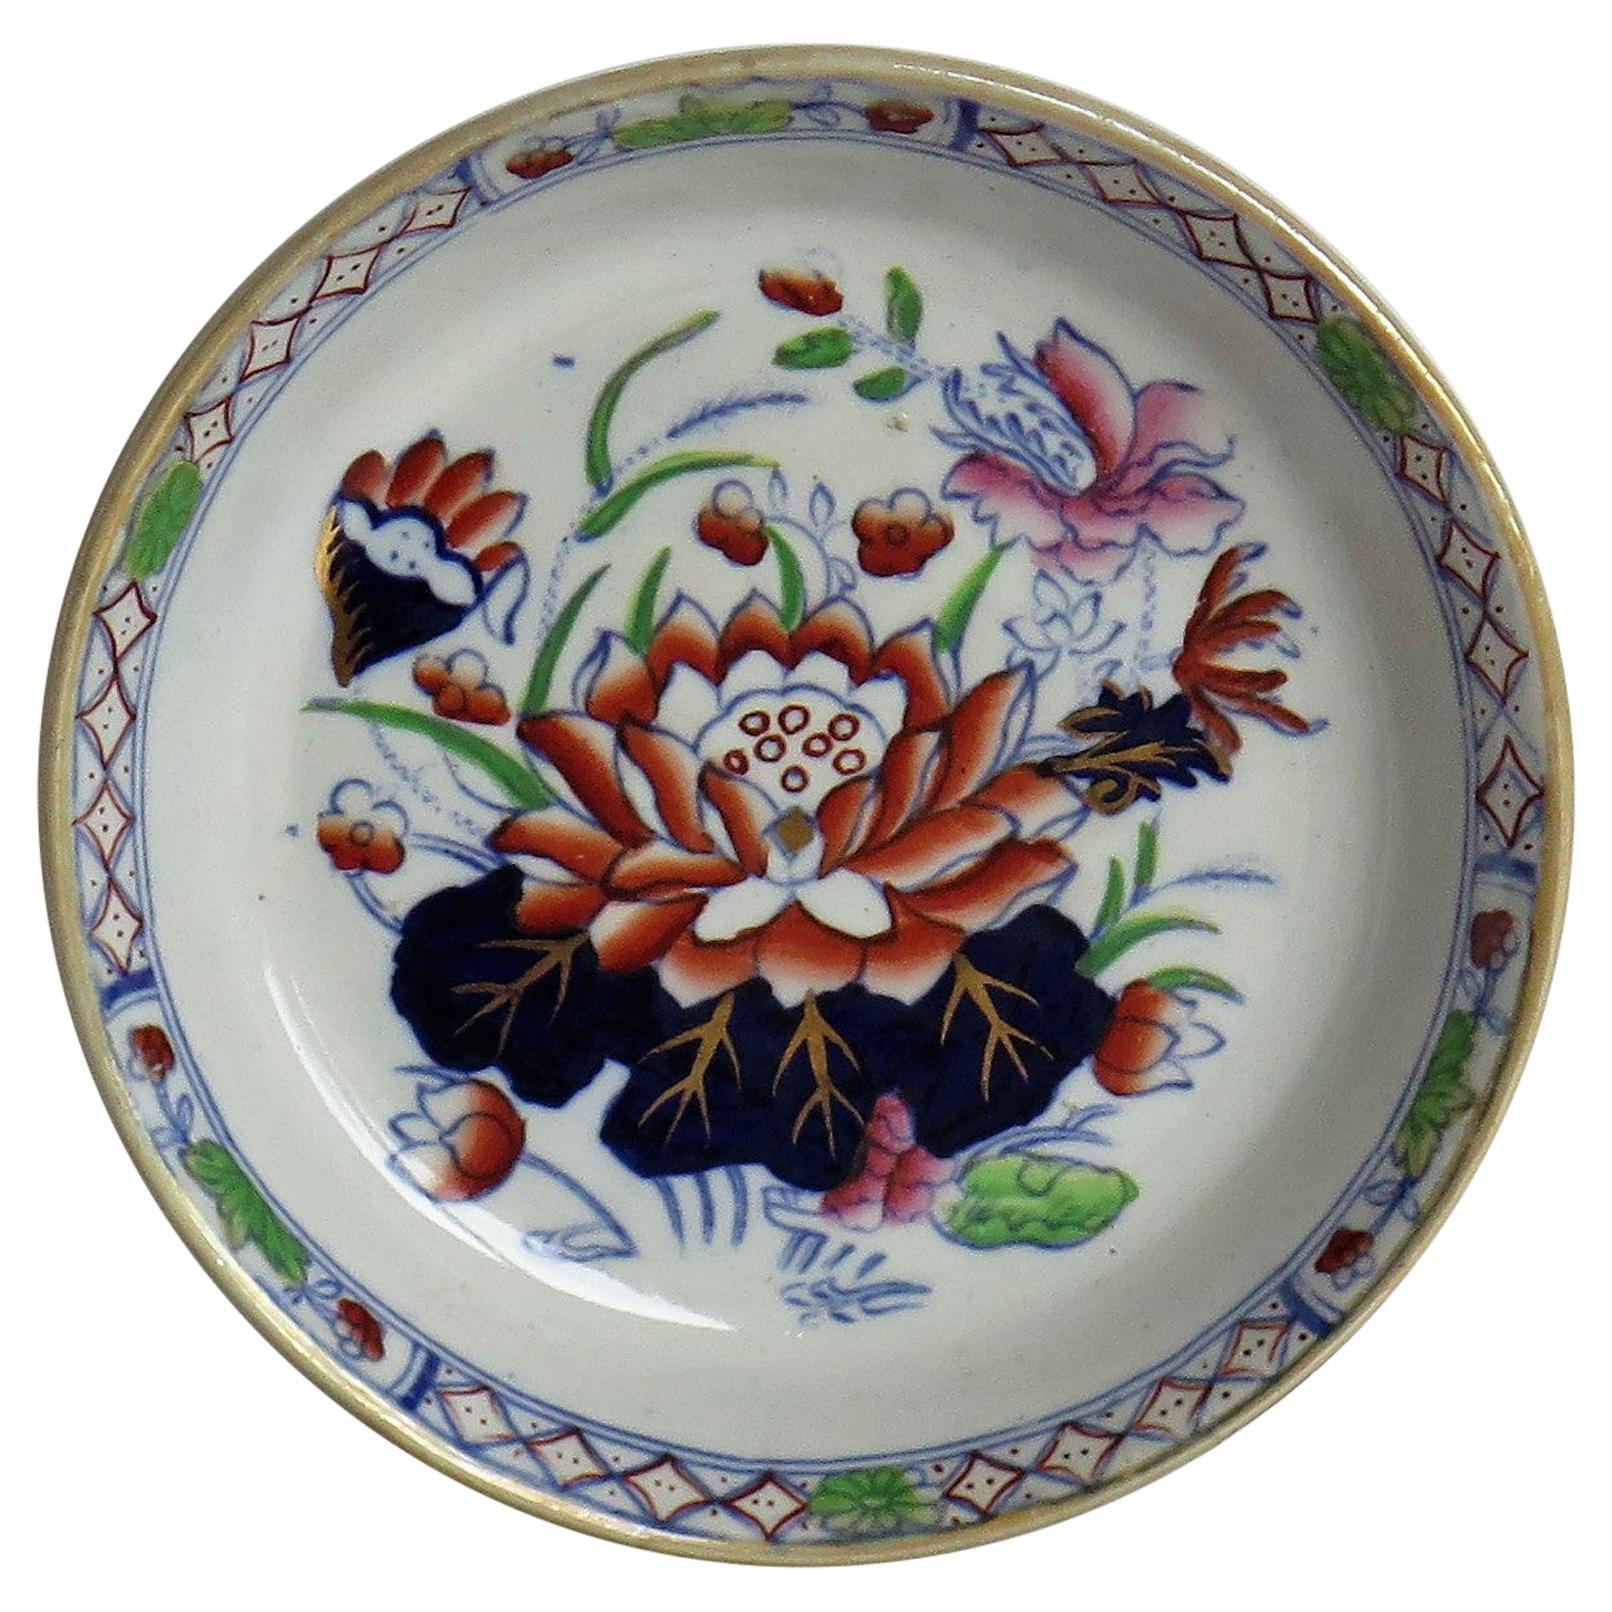 Late 19th Century Mason's Ironstone Small Dish or Pin Tray Water Lily Pattern